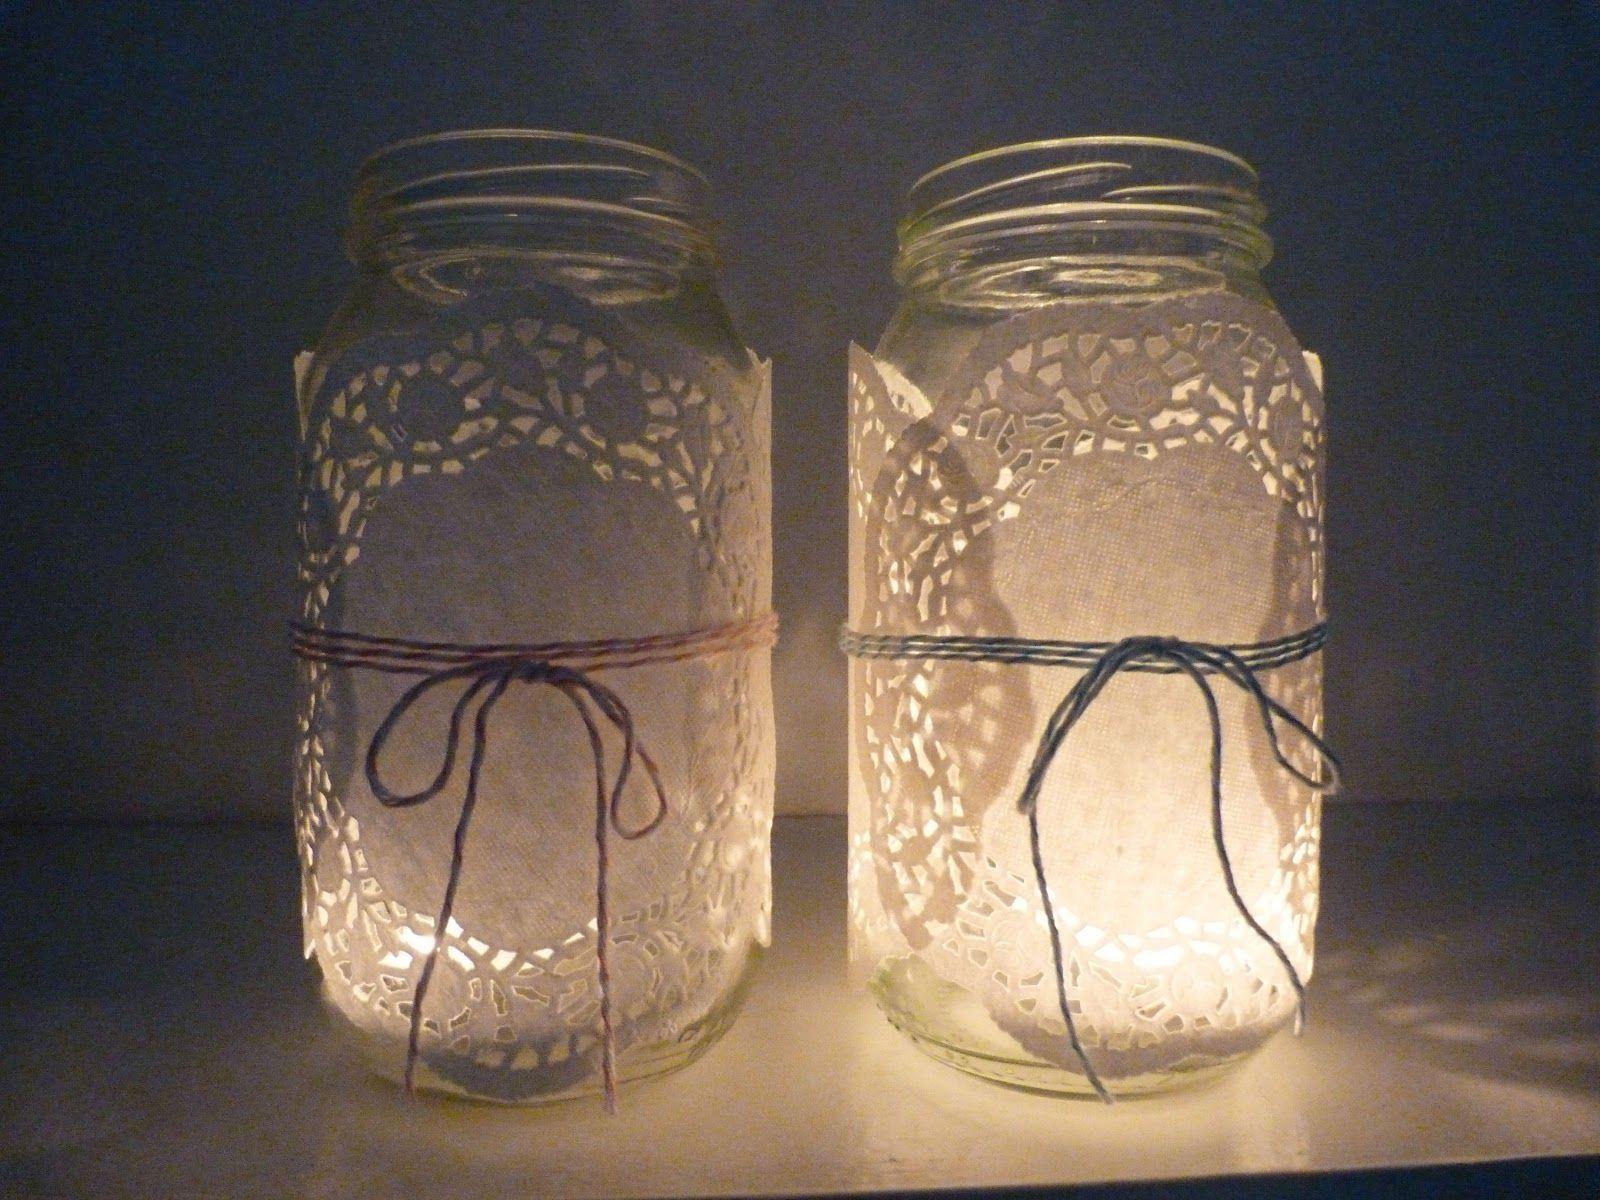 Candle Jar Decorating Ideas Beachcomber Baker's Twine Diy  Weddings & Wedding Showers